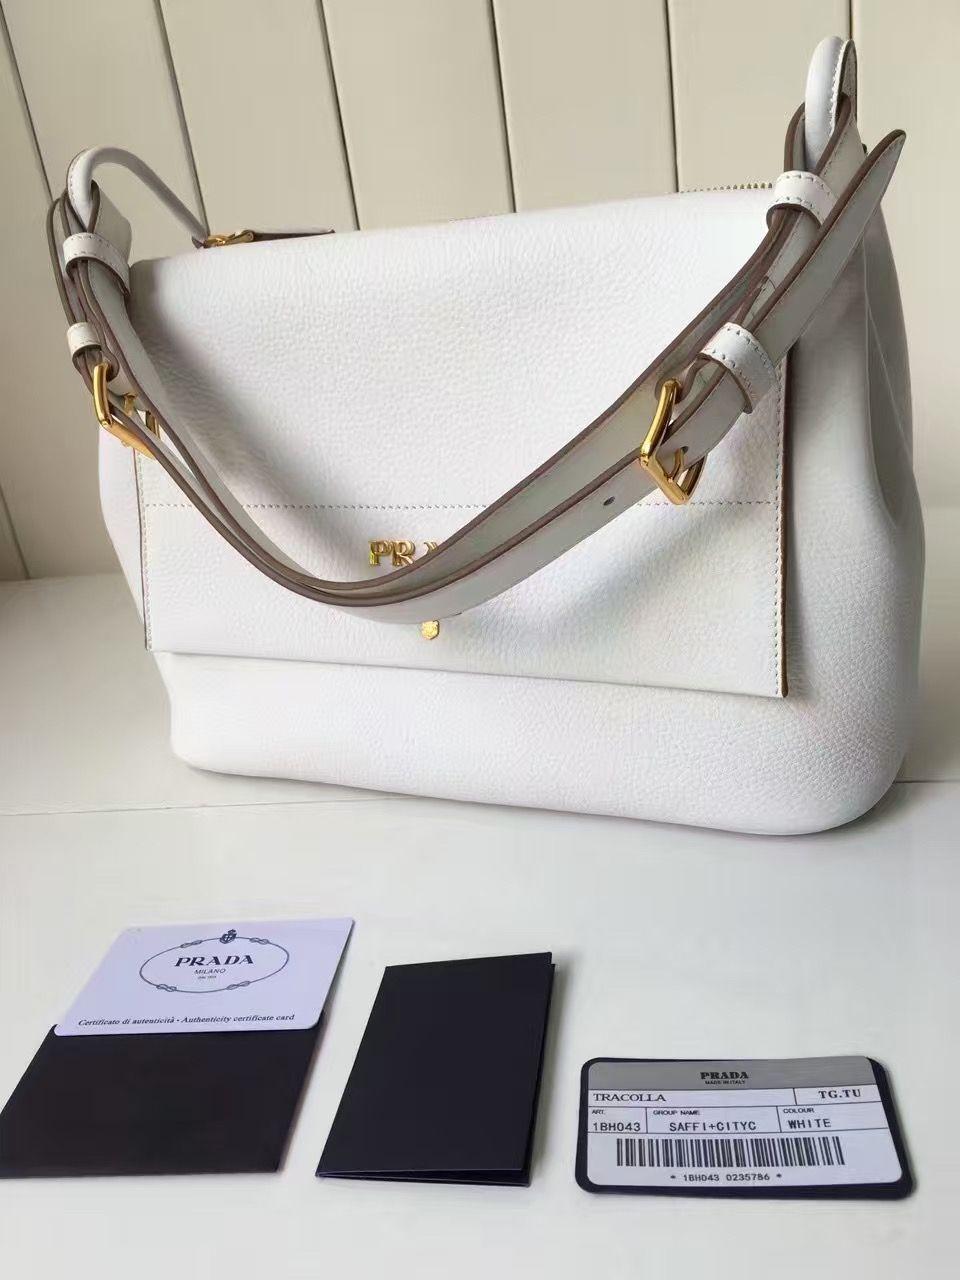 c5ecb1c2b838 Prada 1BD052 Grained Calf Leather Top Handle Bag White 2016